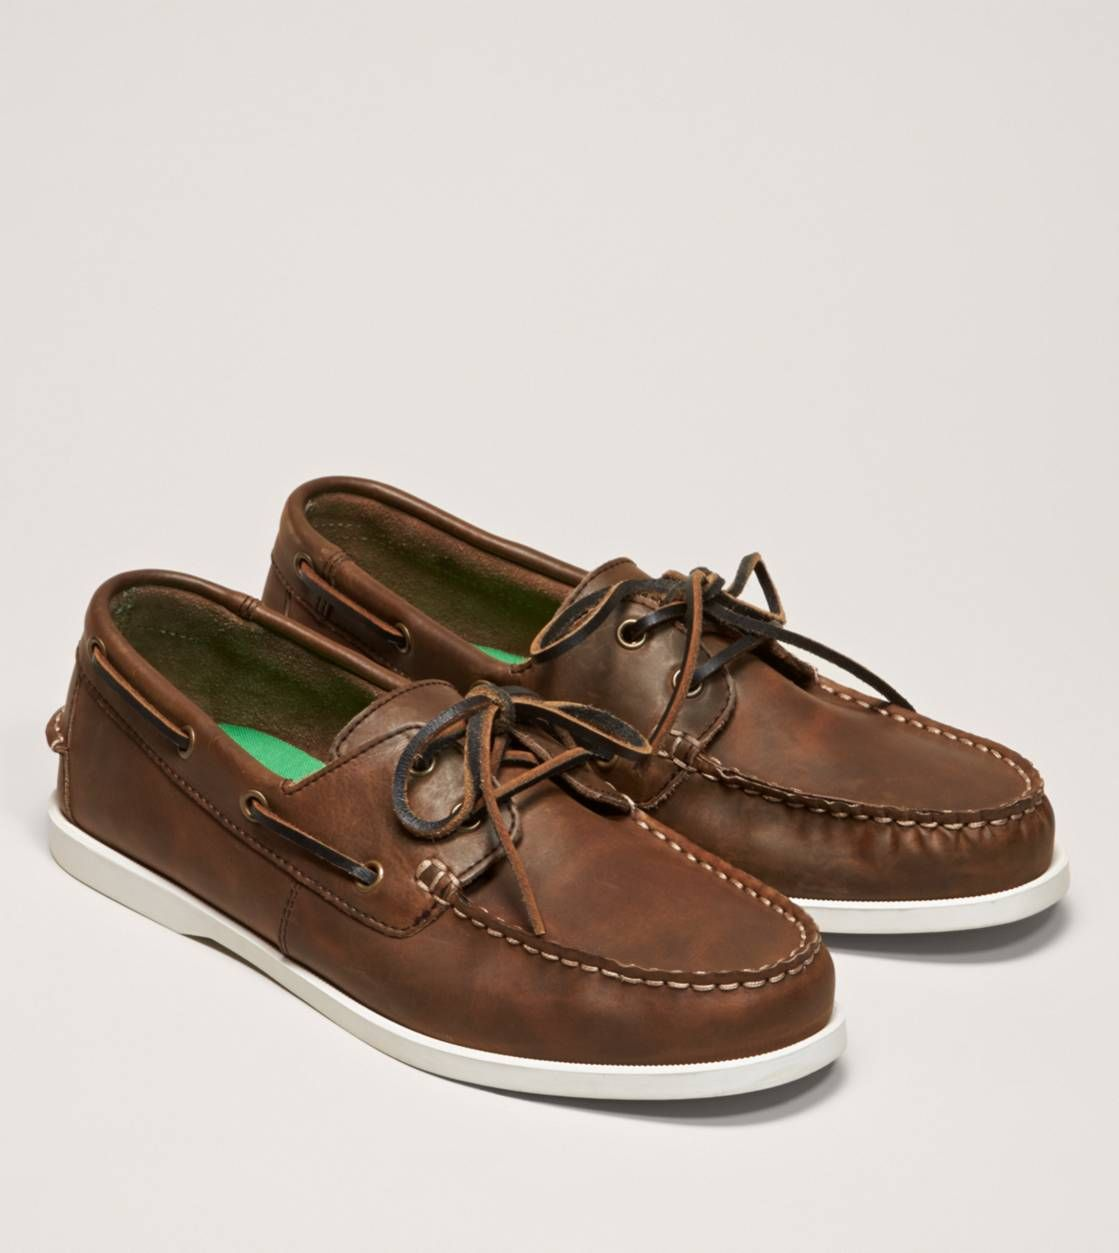 Zapatillas para barcos con dise?o de 2 ojos para hombre, color tostado, 7 M US